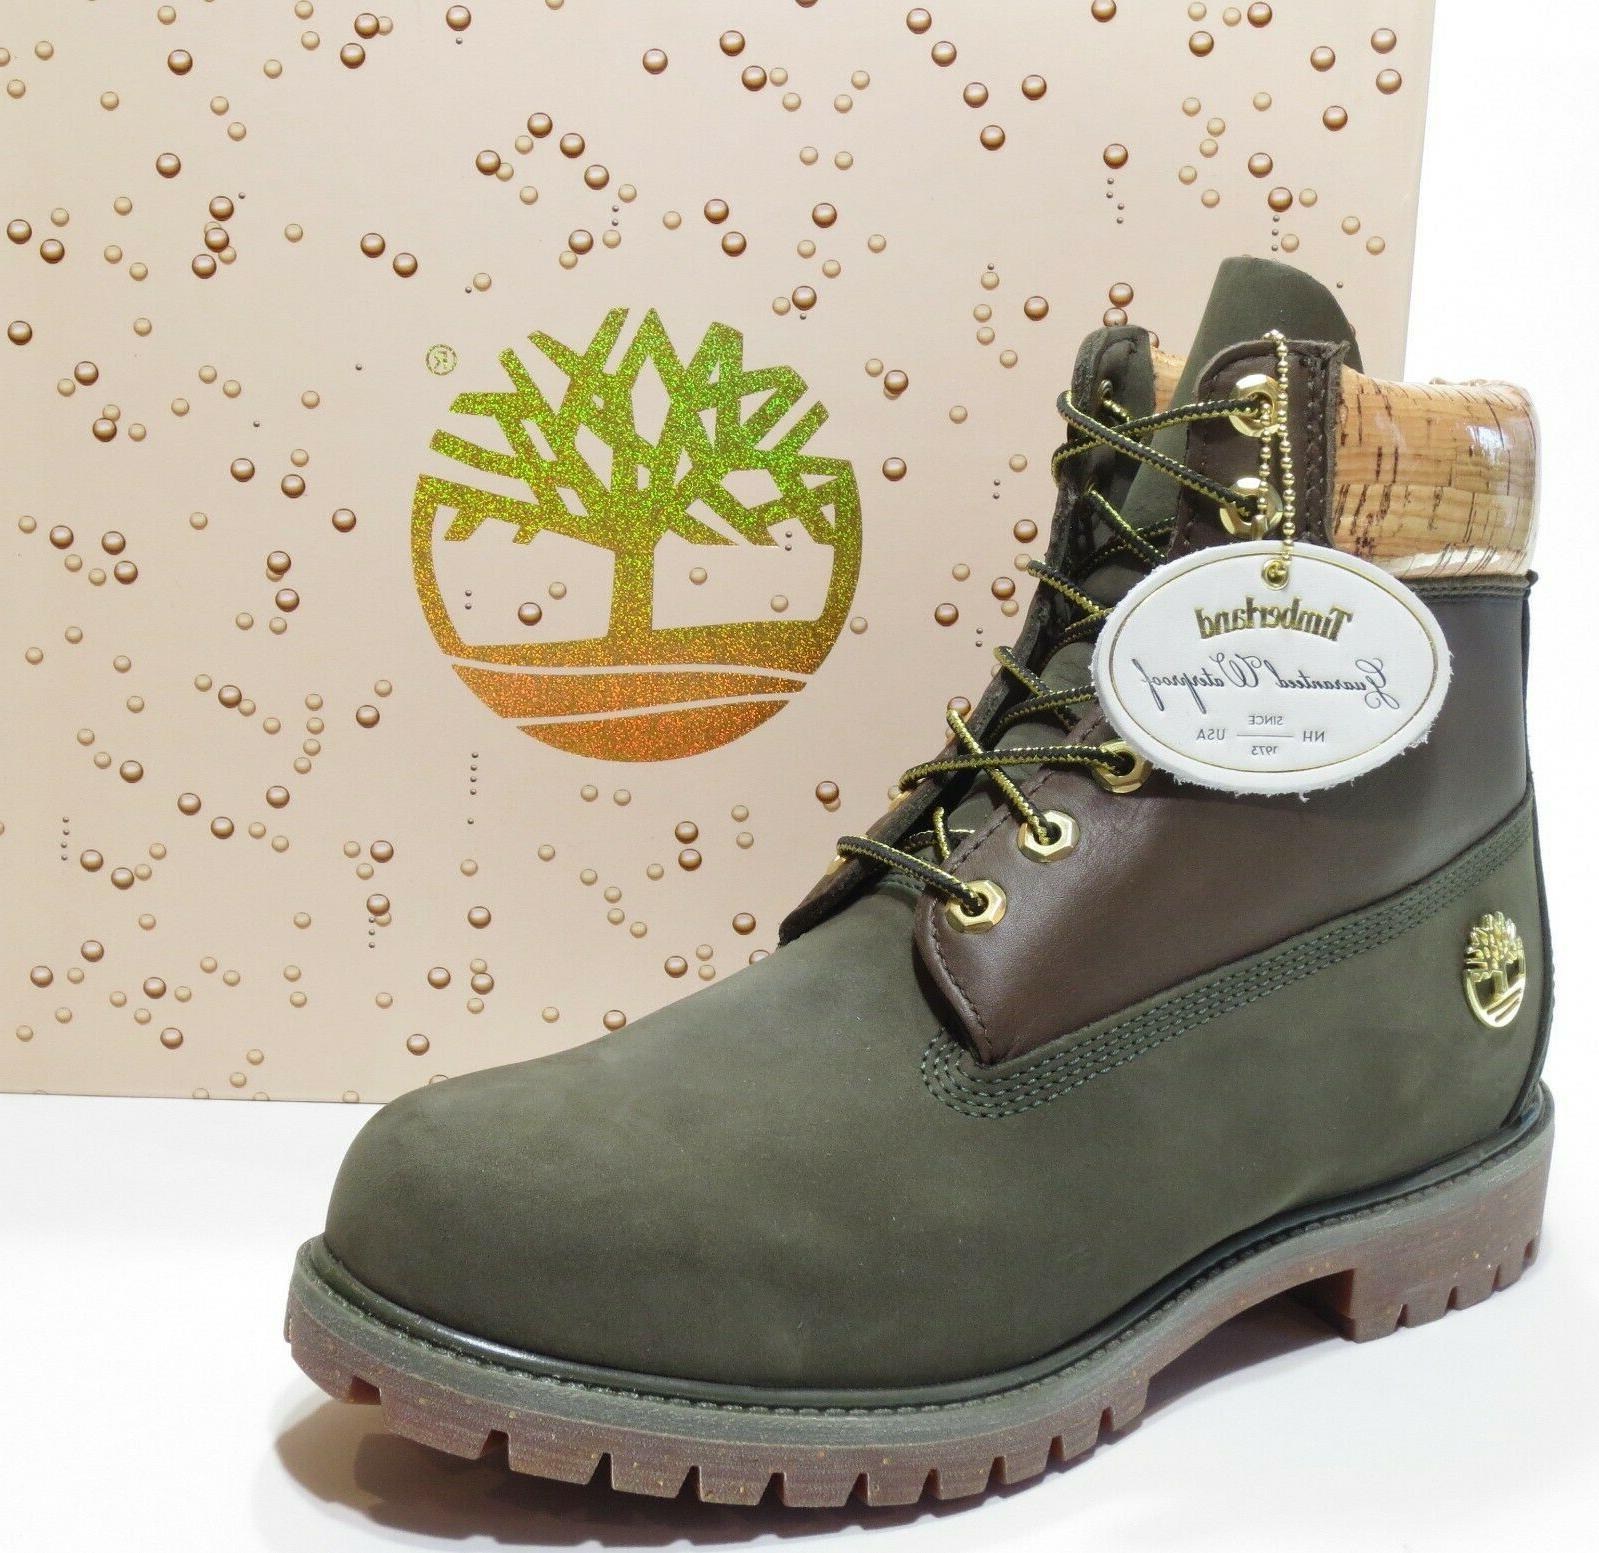 Timberland Men's Premium 6 inch Limited Release Boots Dark